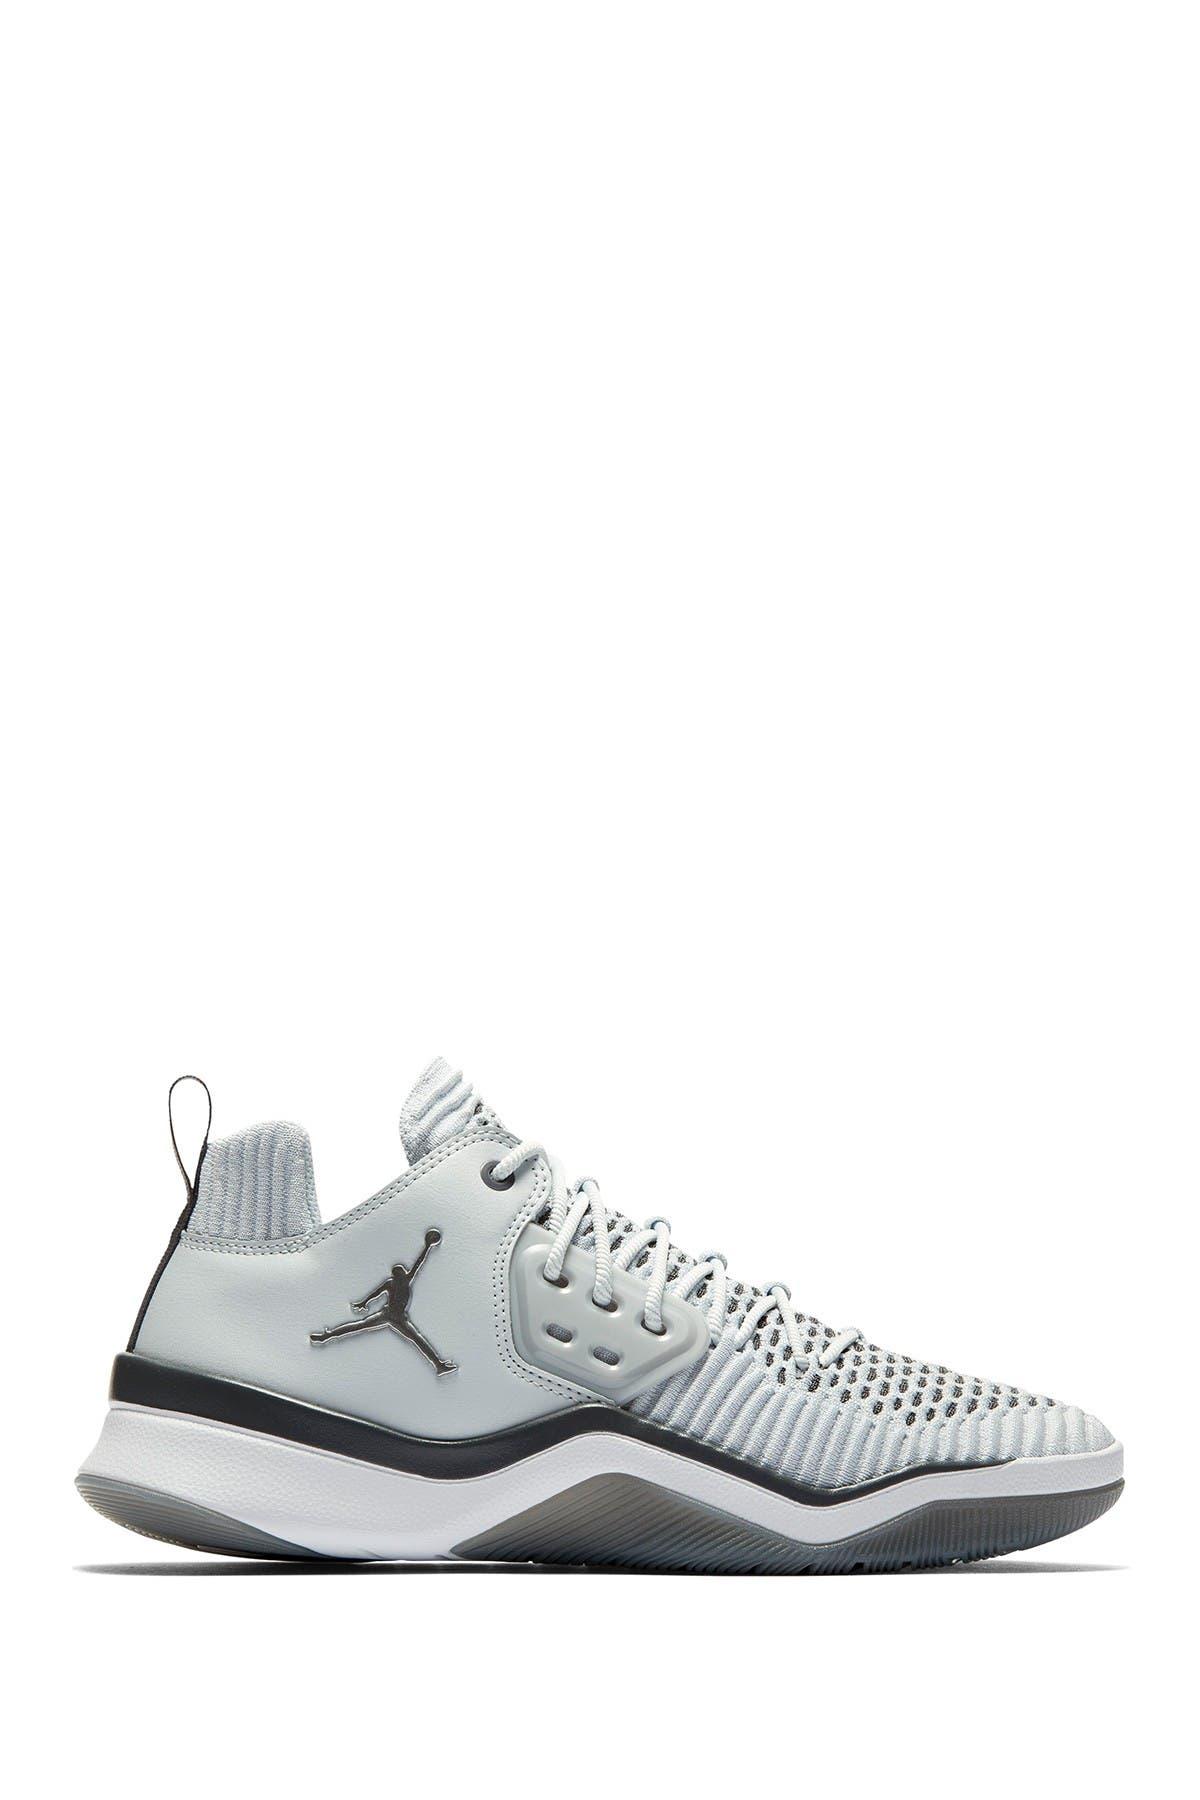 Nike | Jordan DNA LX Sneaker